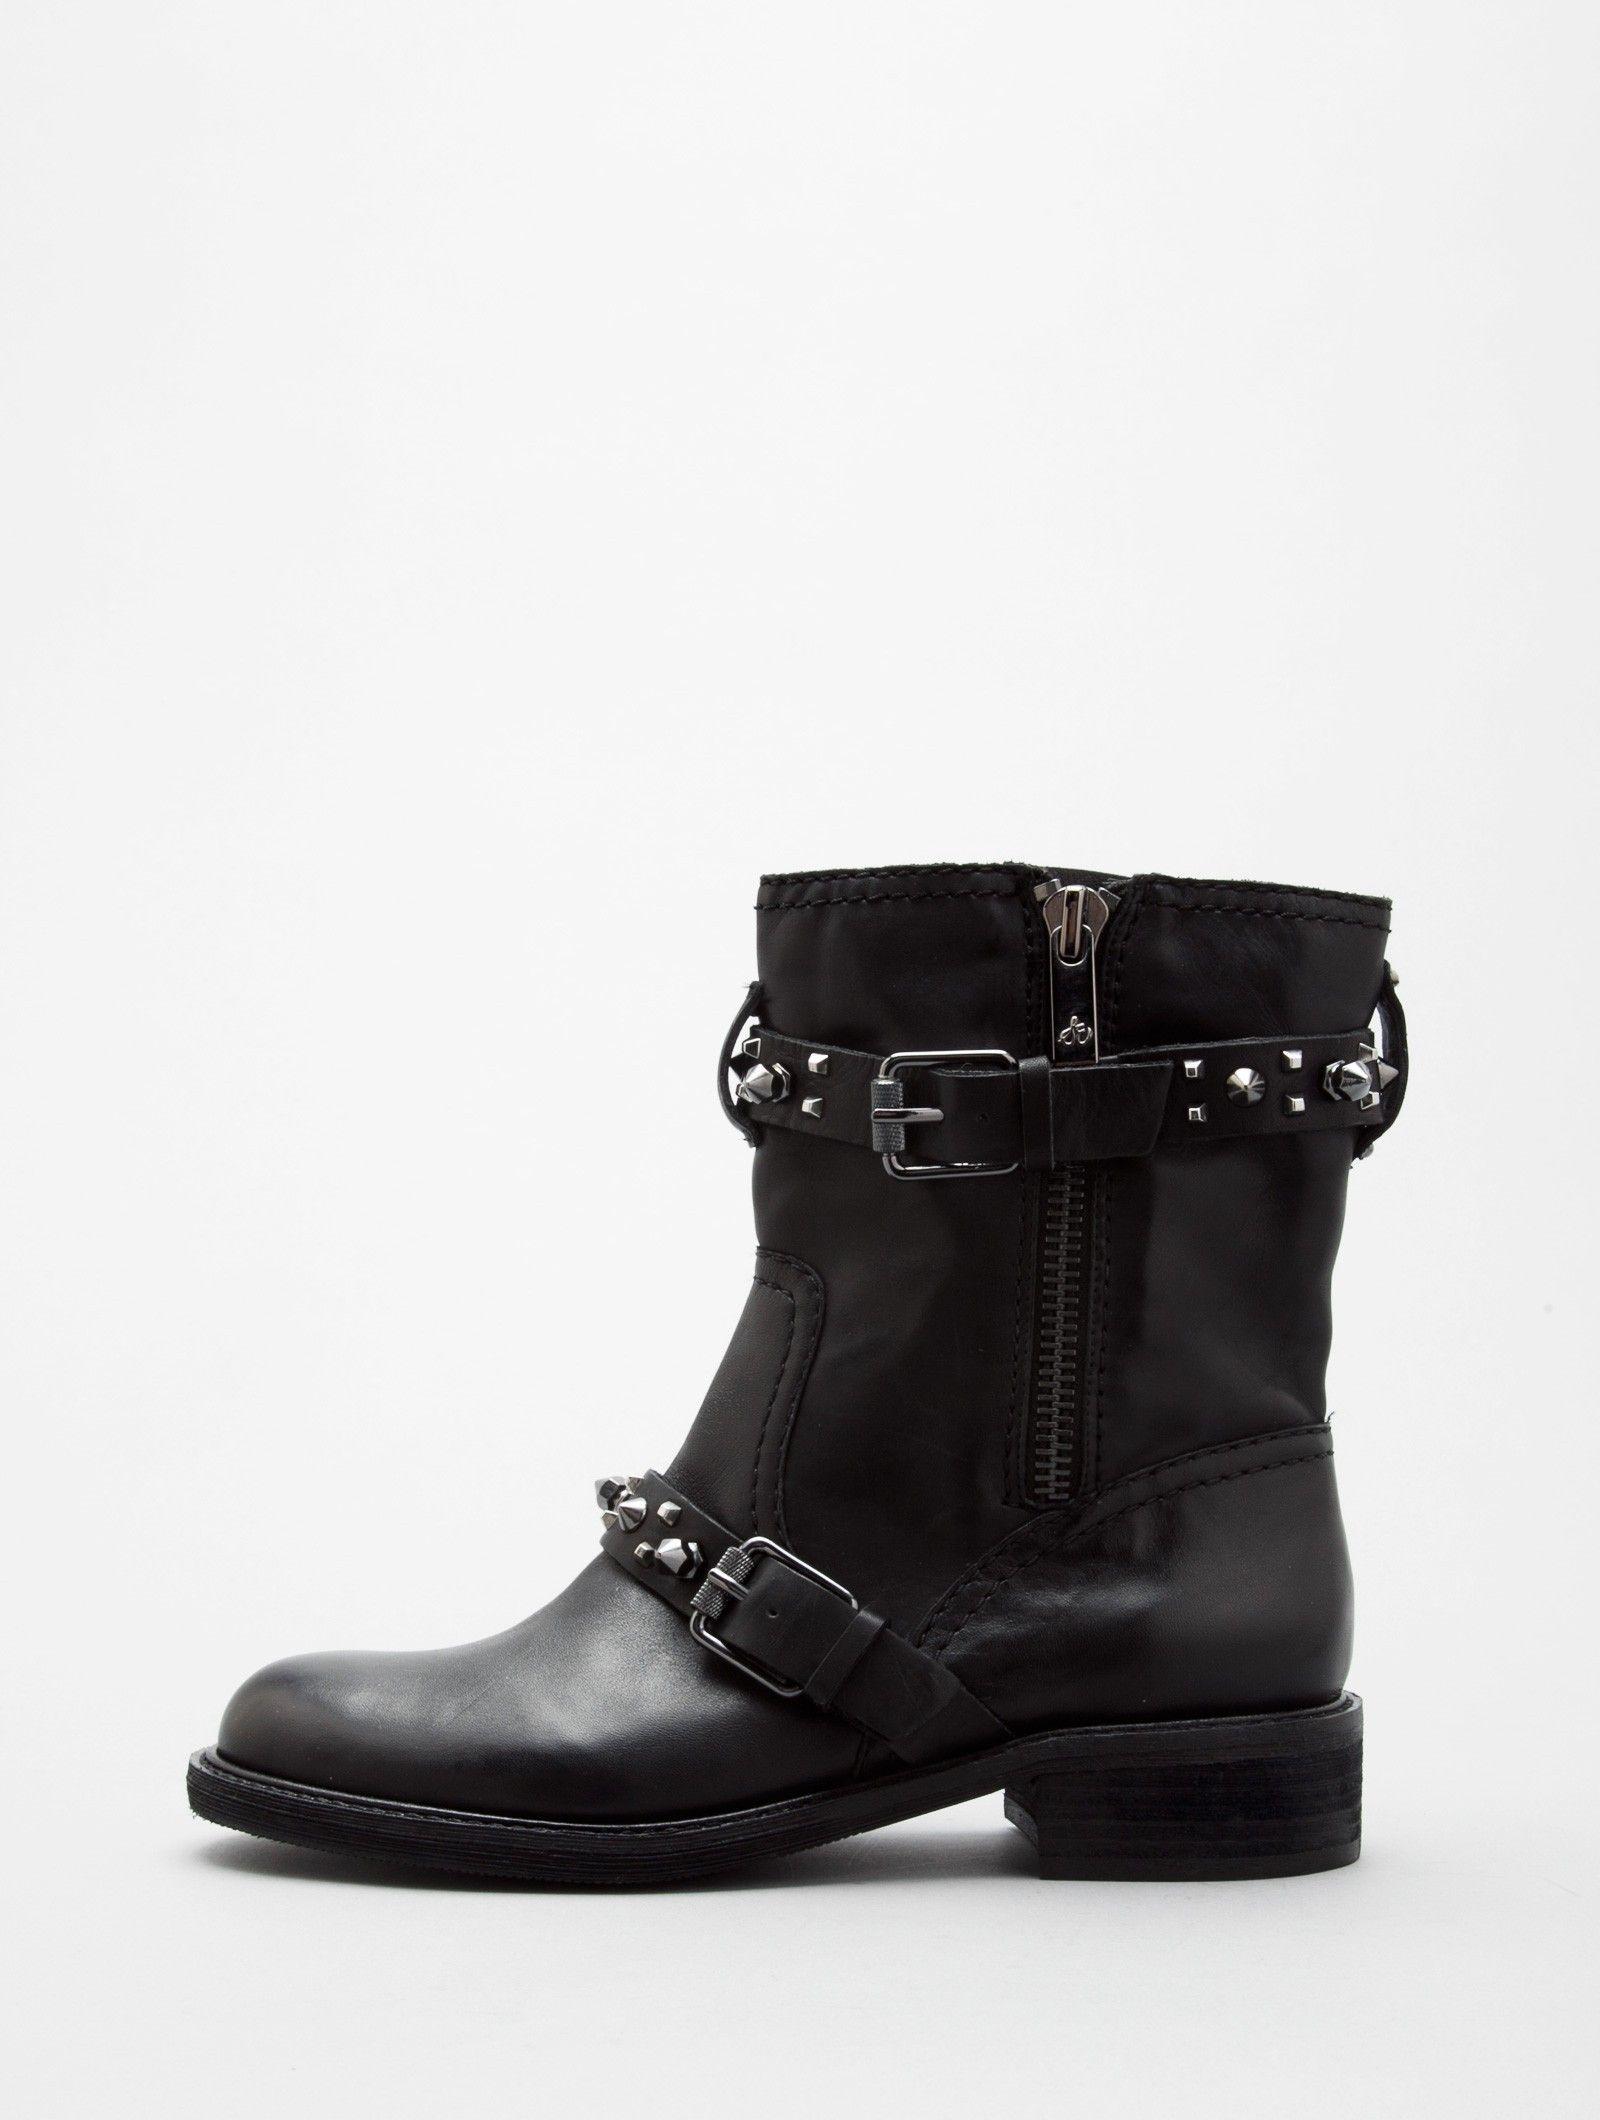 b8cc30d3b Adele boots by Sam Edelman